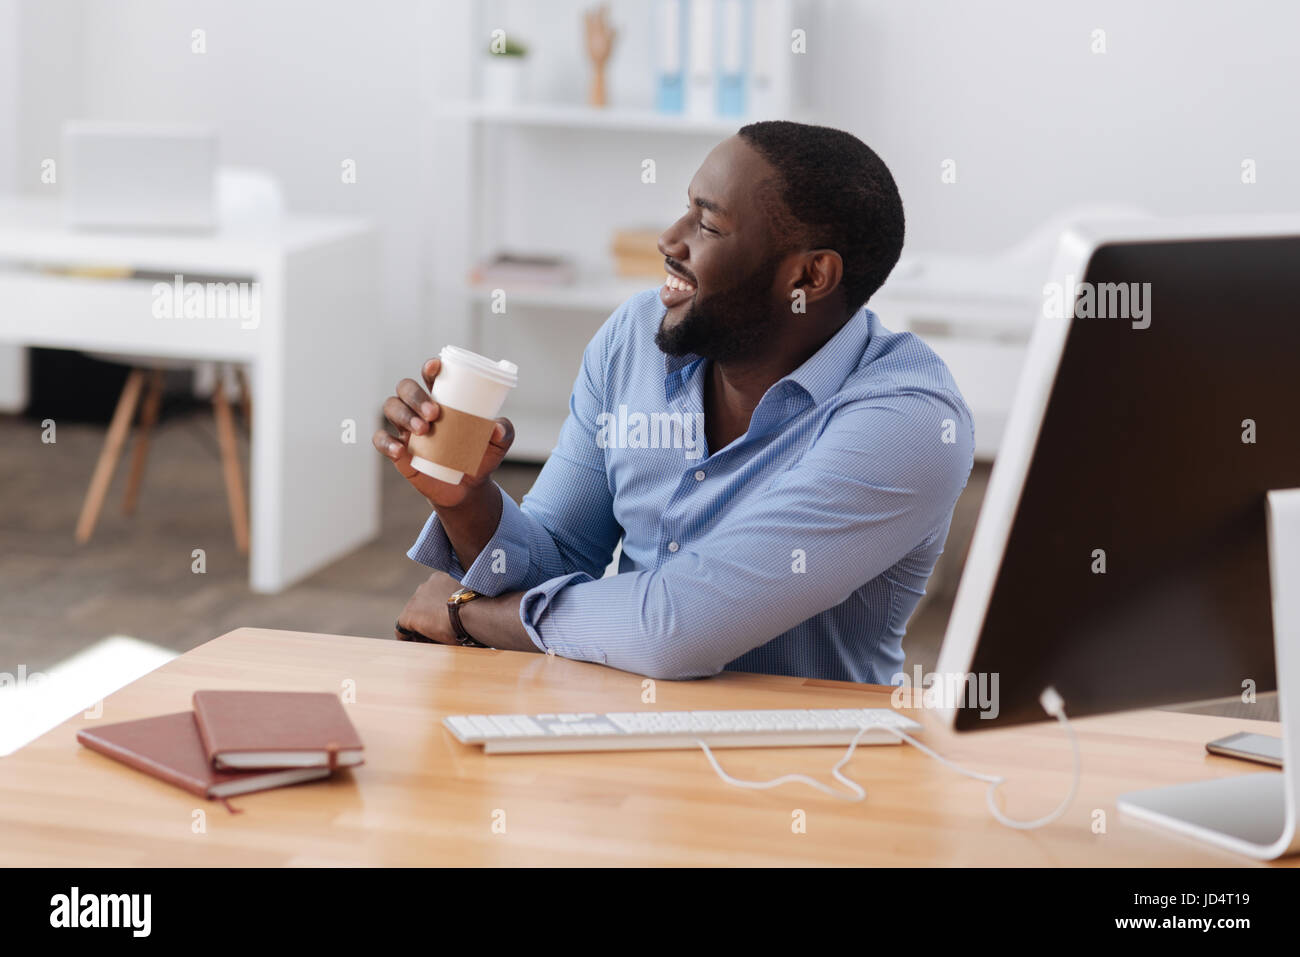 Glücklicher positiven Mann hält eine Tasse Kaffee Stockbild